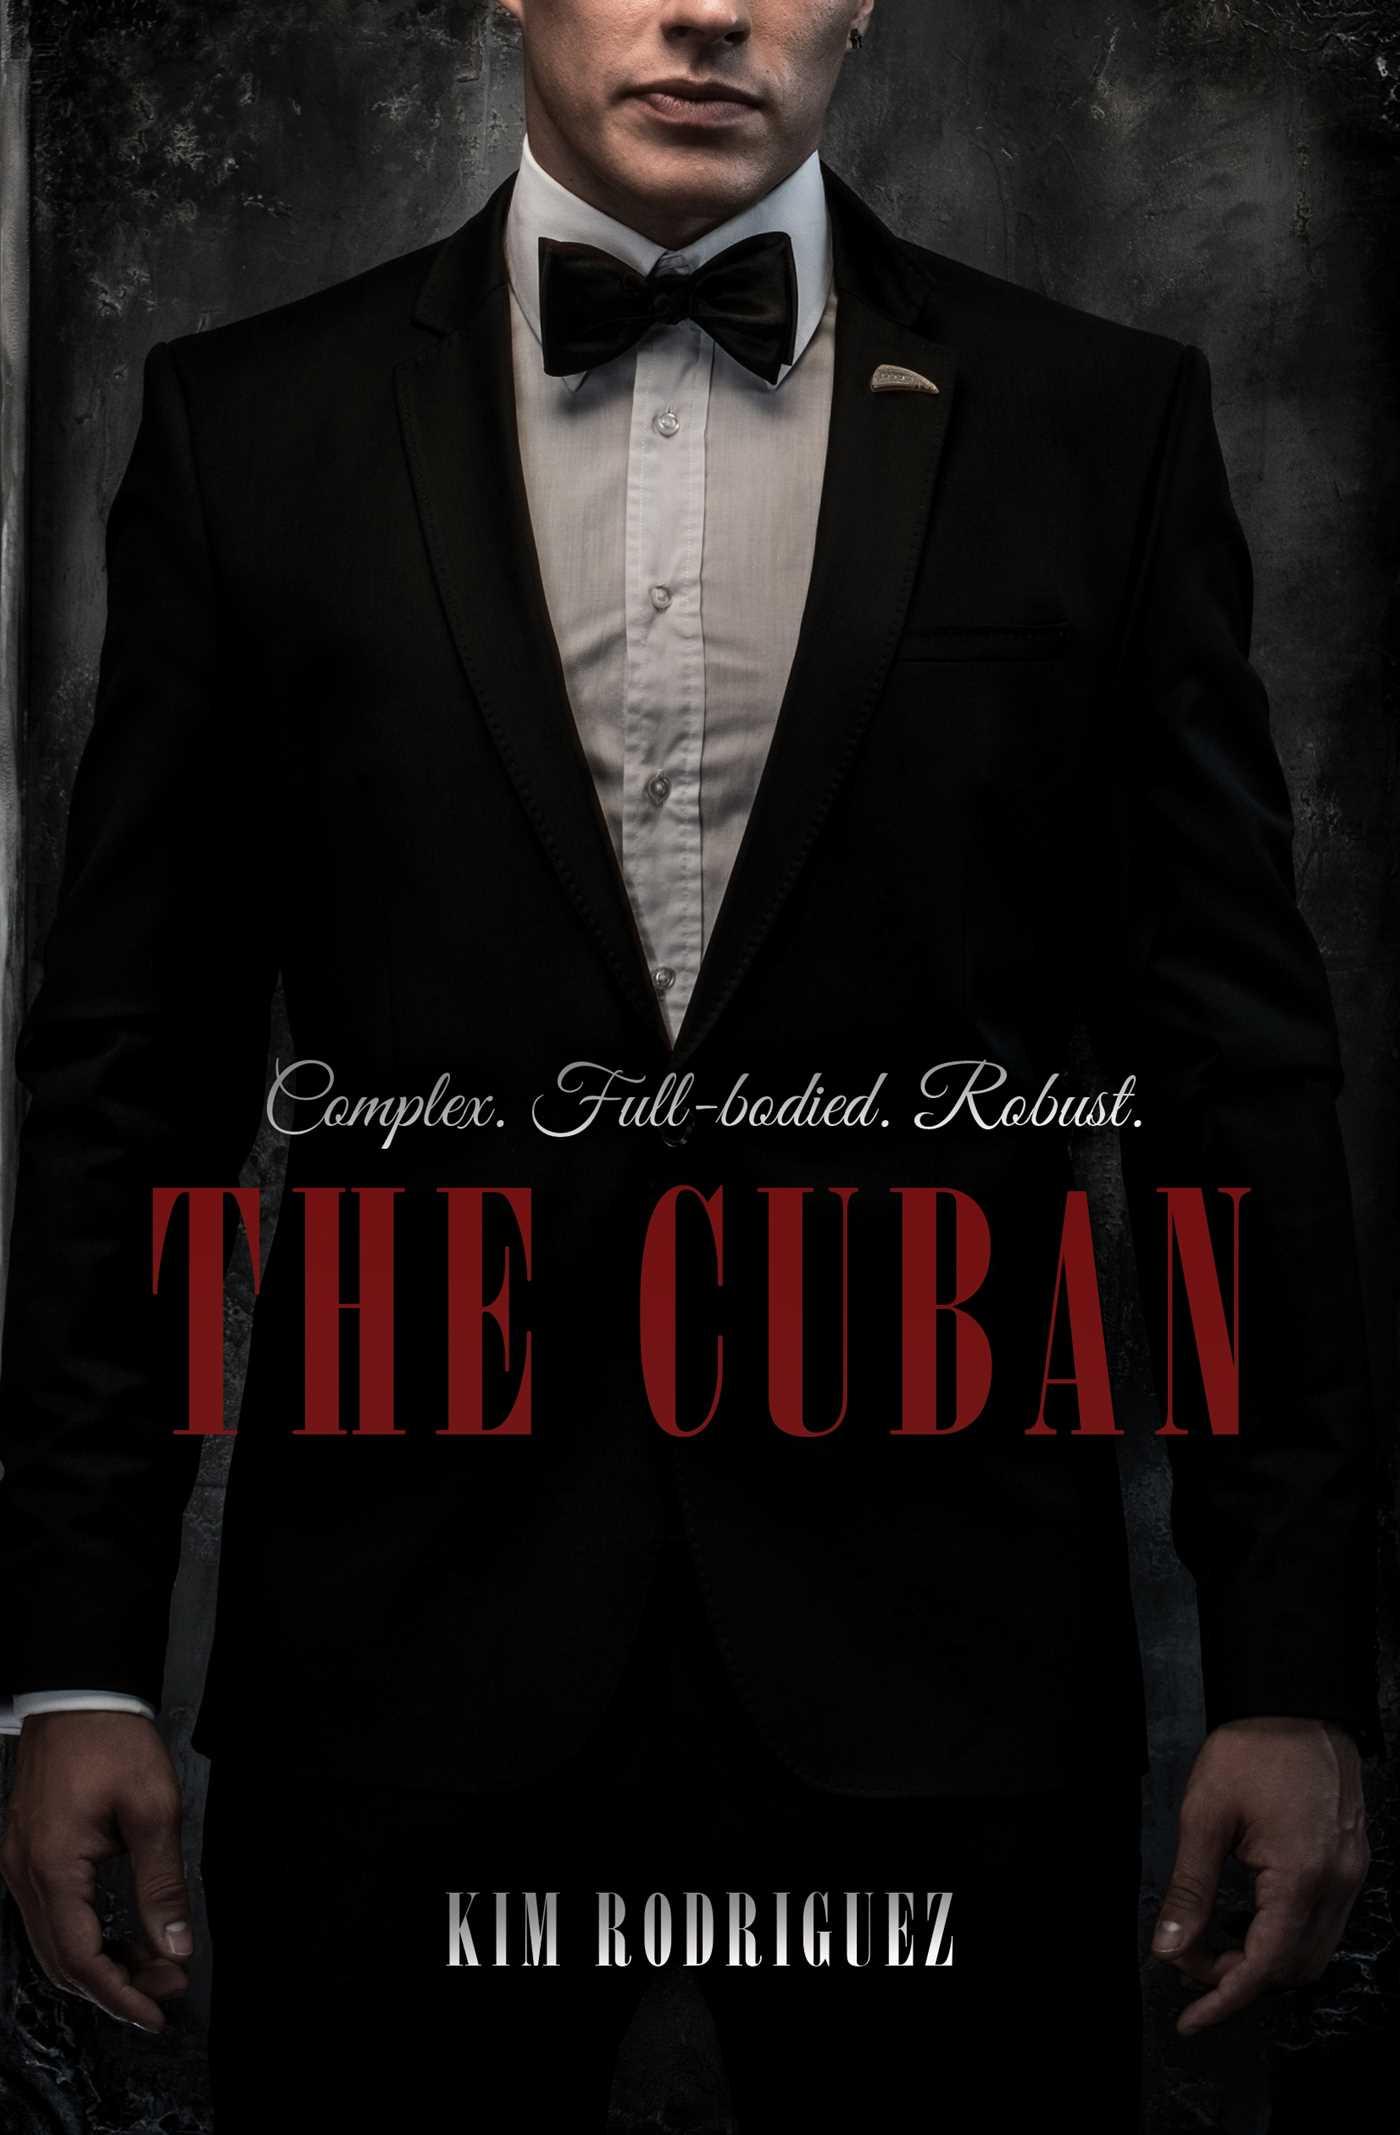 The cuban 9781623422561 hr